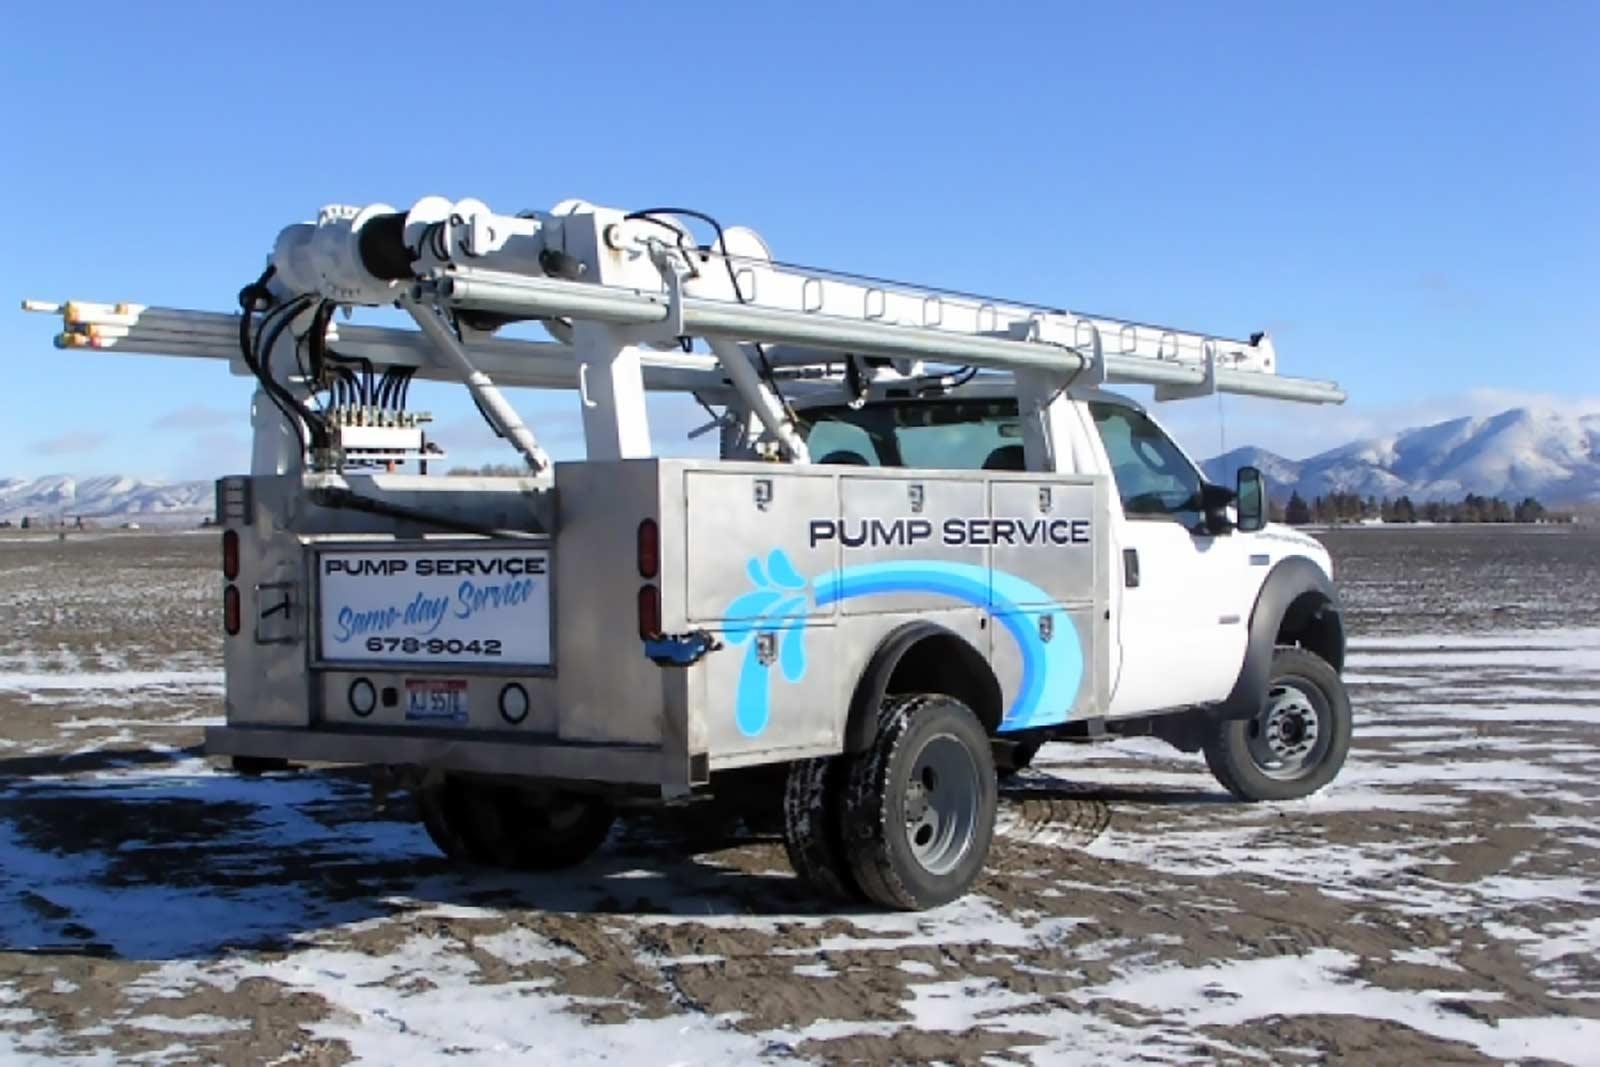 PumpServiceIdaho.com Well Drilling